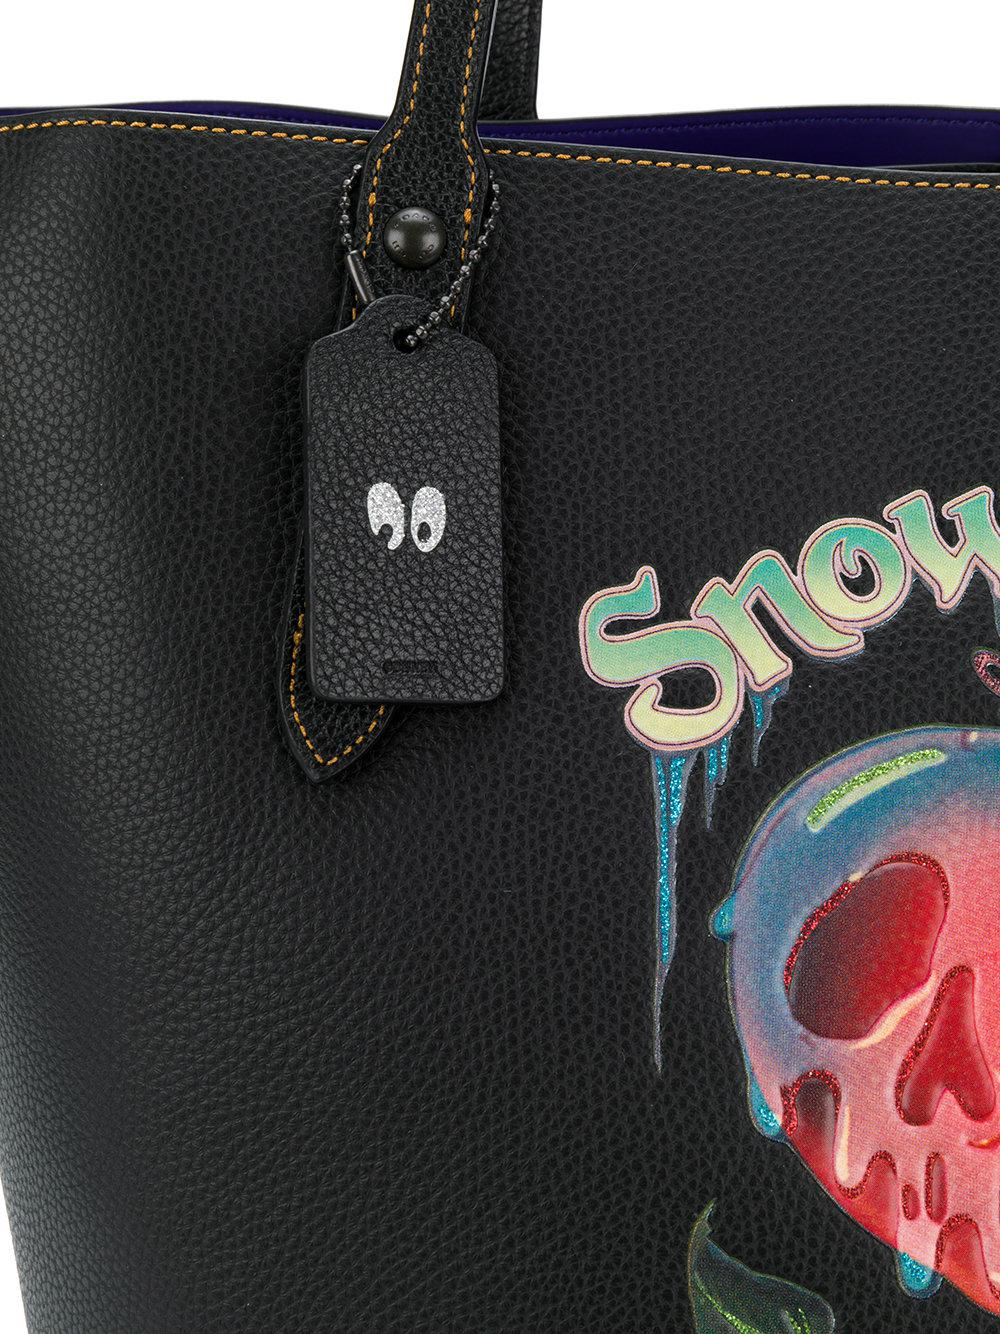 649dcc2b15c Lyst - COACH X Disney Snow White Tote in Black